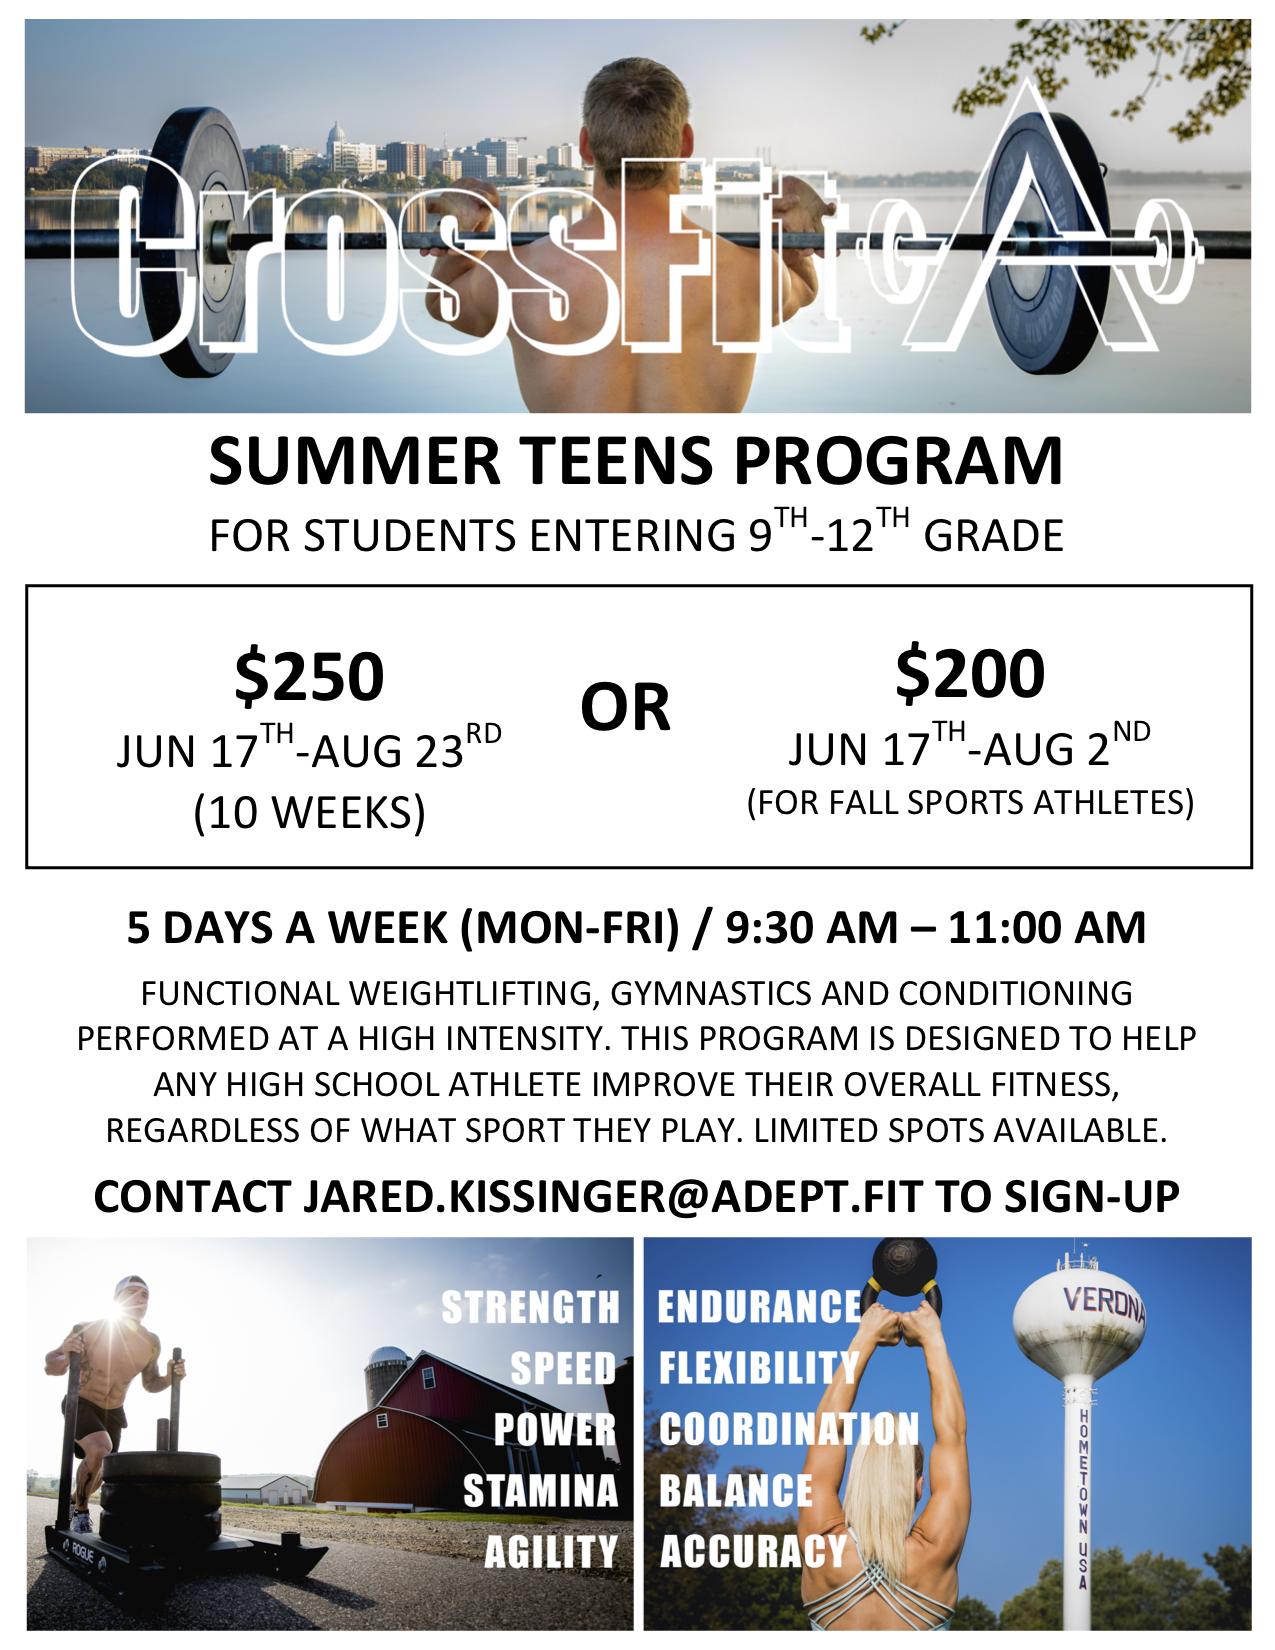 Summer Teens Program Flyer.png